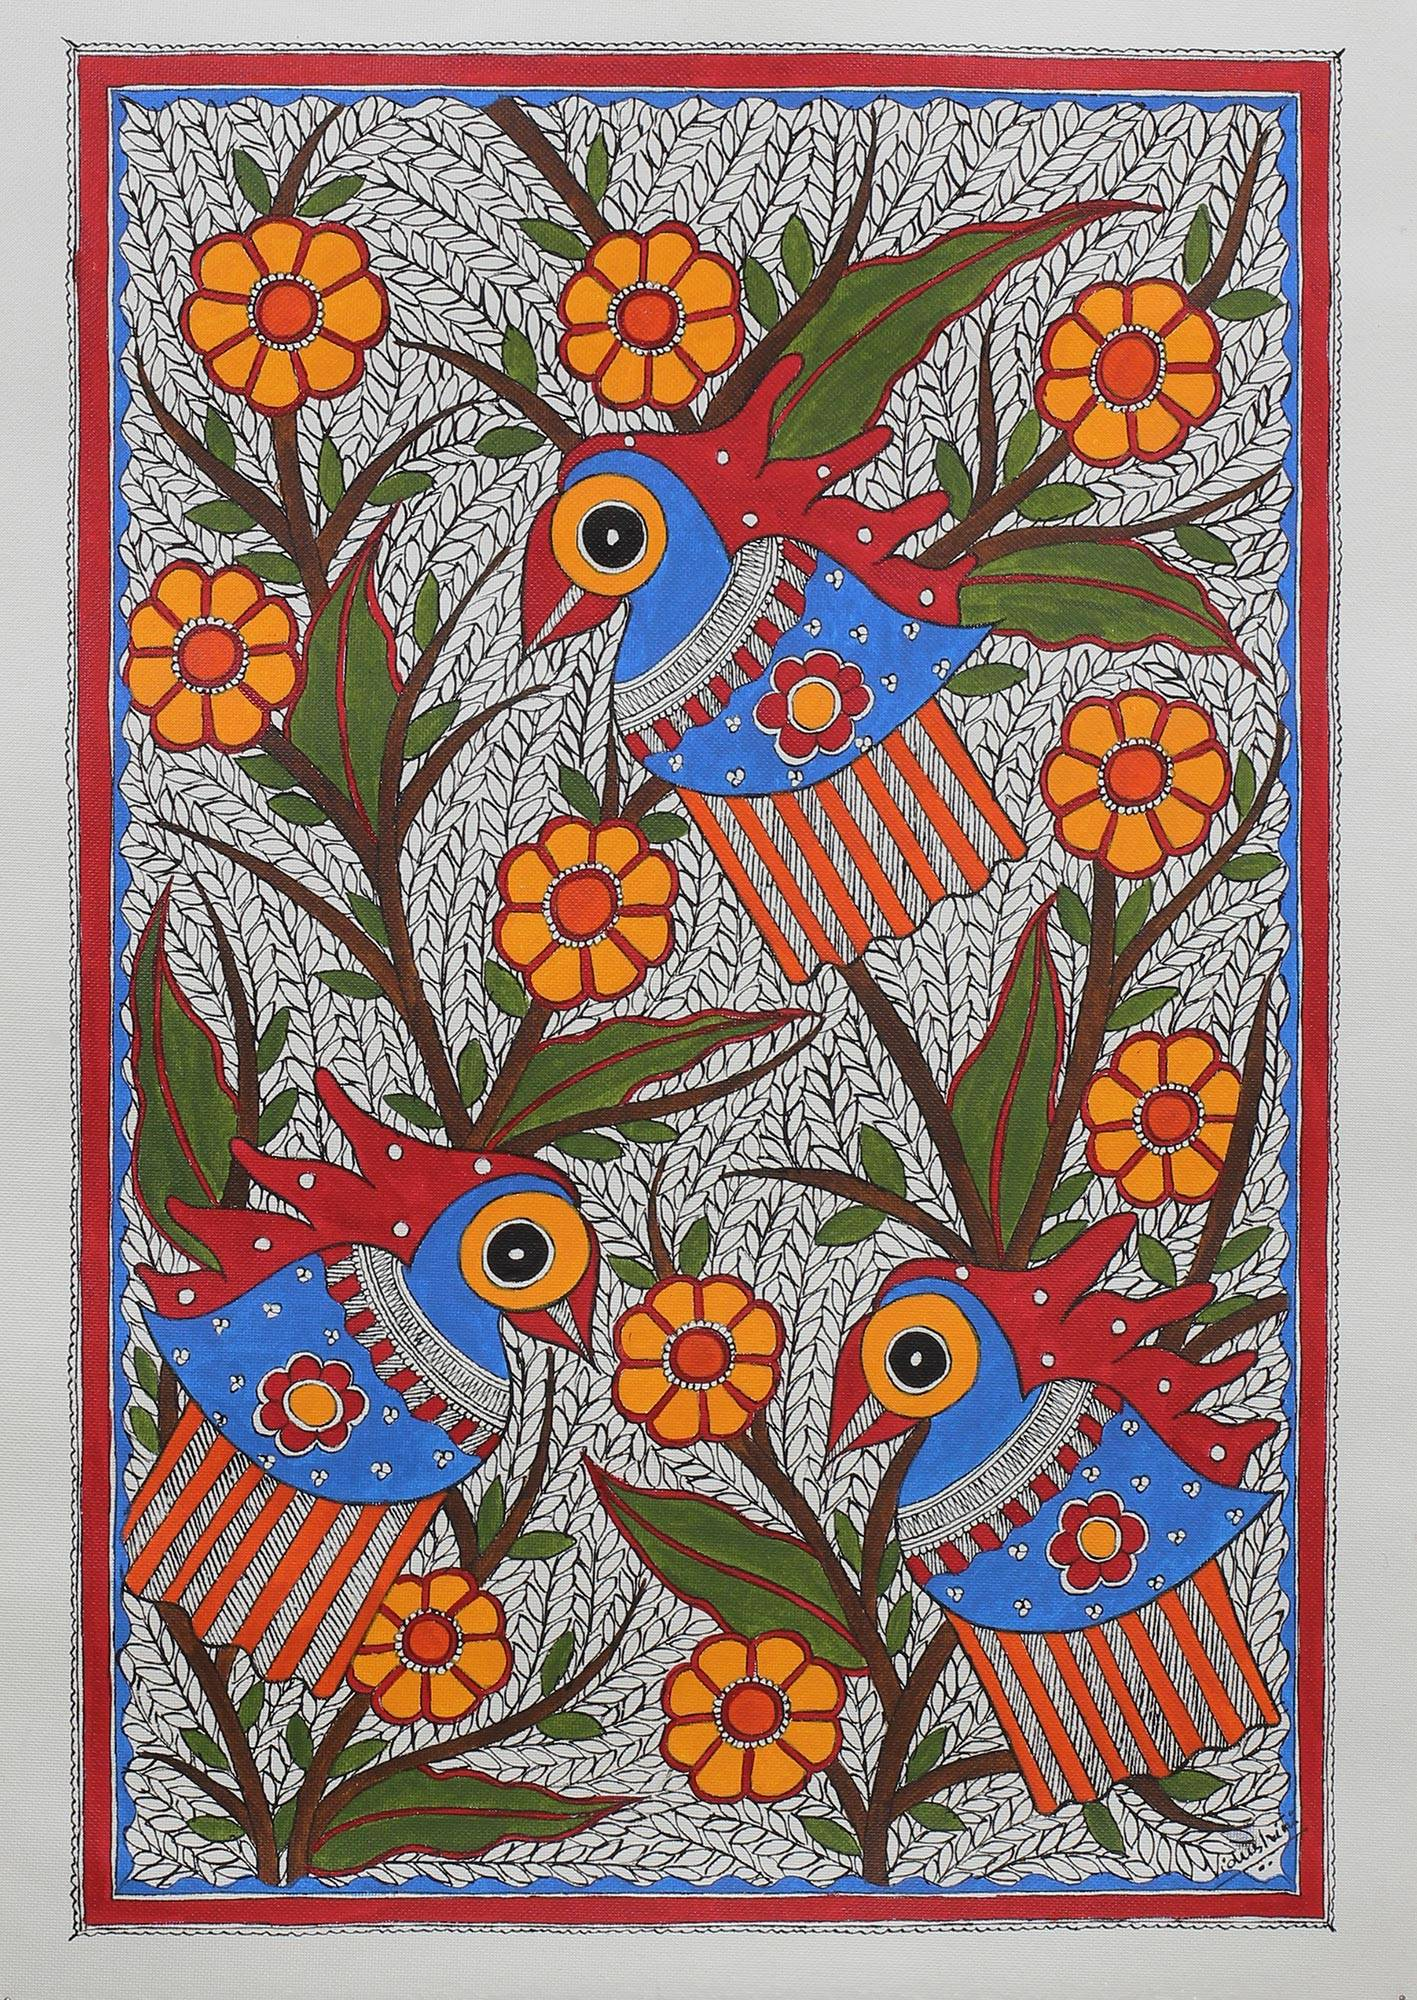 Folk art color chart acrylic paint - Madhubani Painting Jovial Parrots Traditional Indian Madhubani Painting Of Parrots And Birds